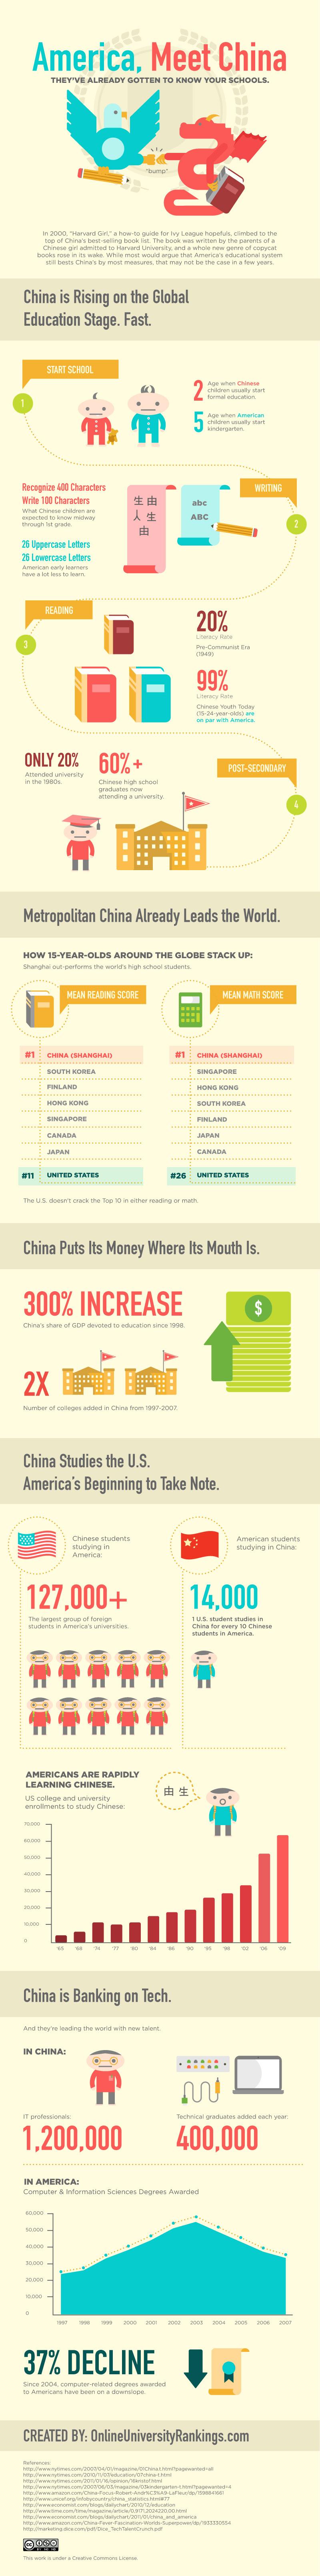 America Meet China